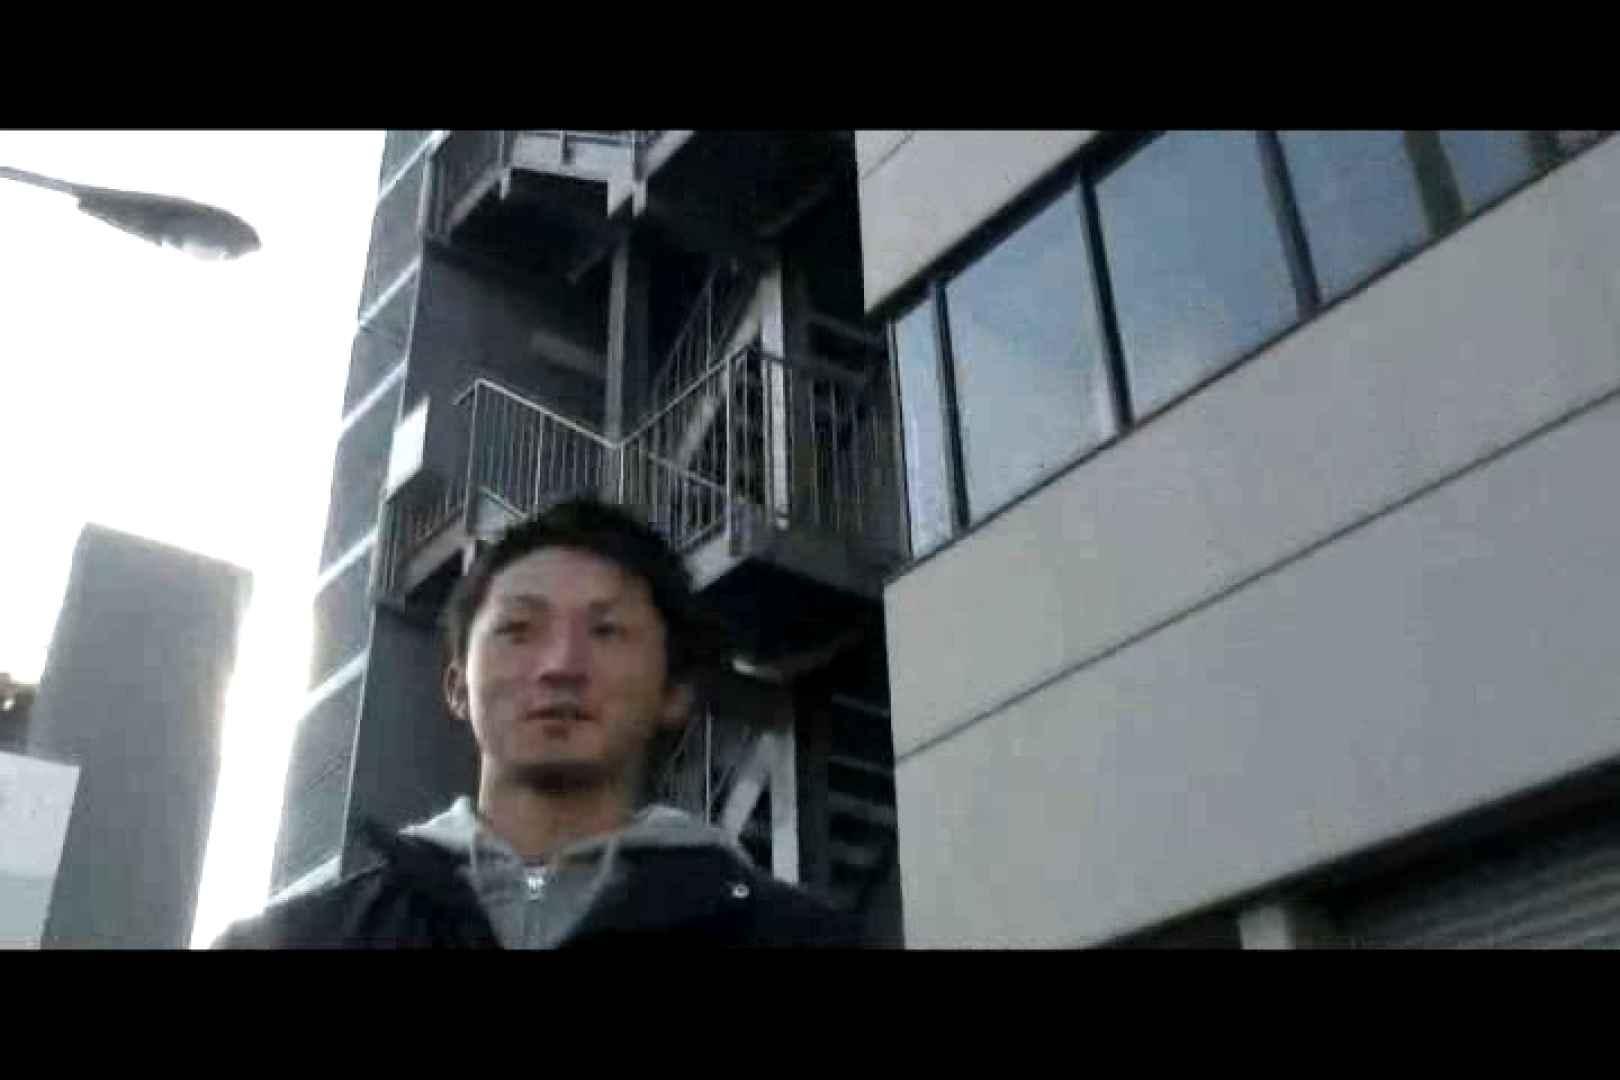 Bistro「イケメン」~Mokkori和風仕立て~vol.01 ディープキス ゲイフリーエロ画像 111pic 6